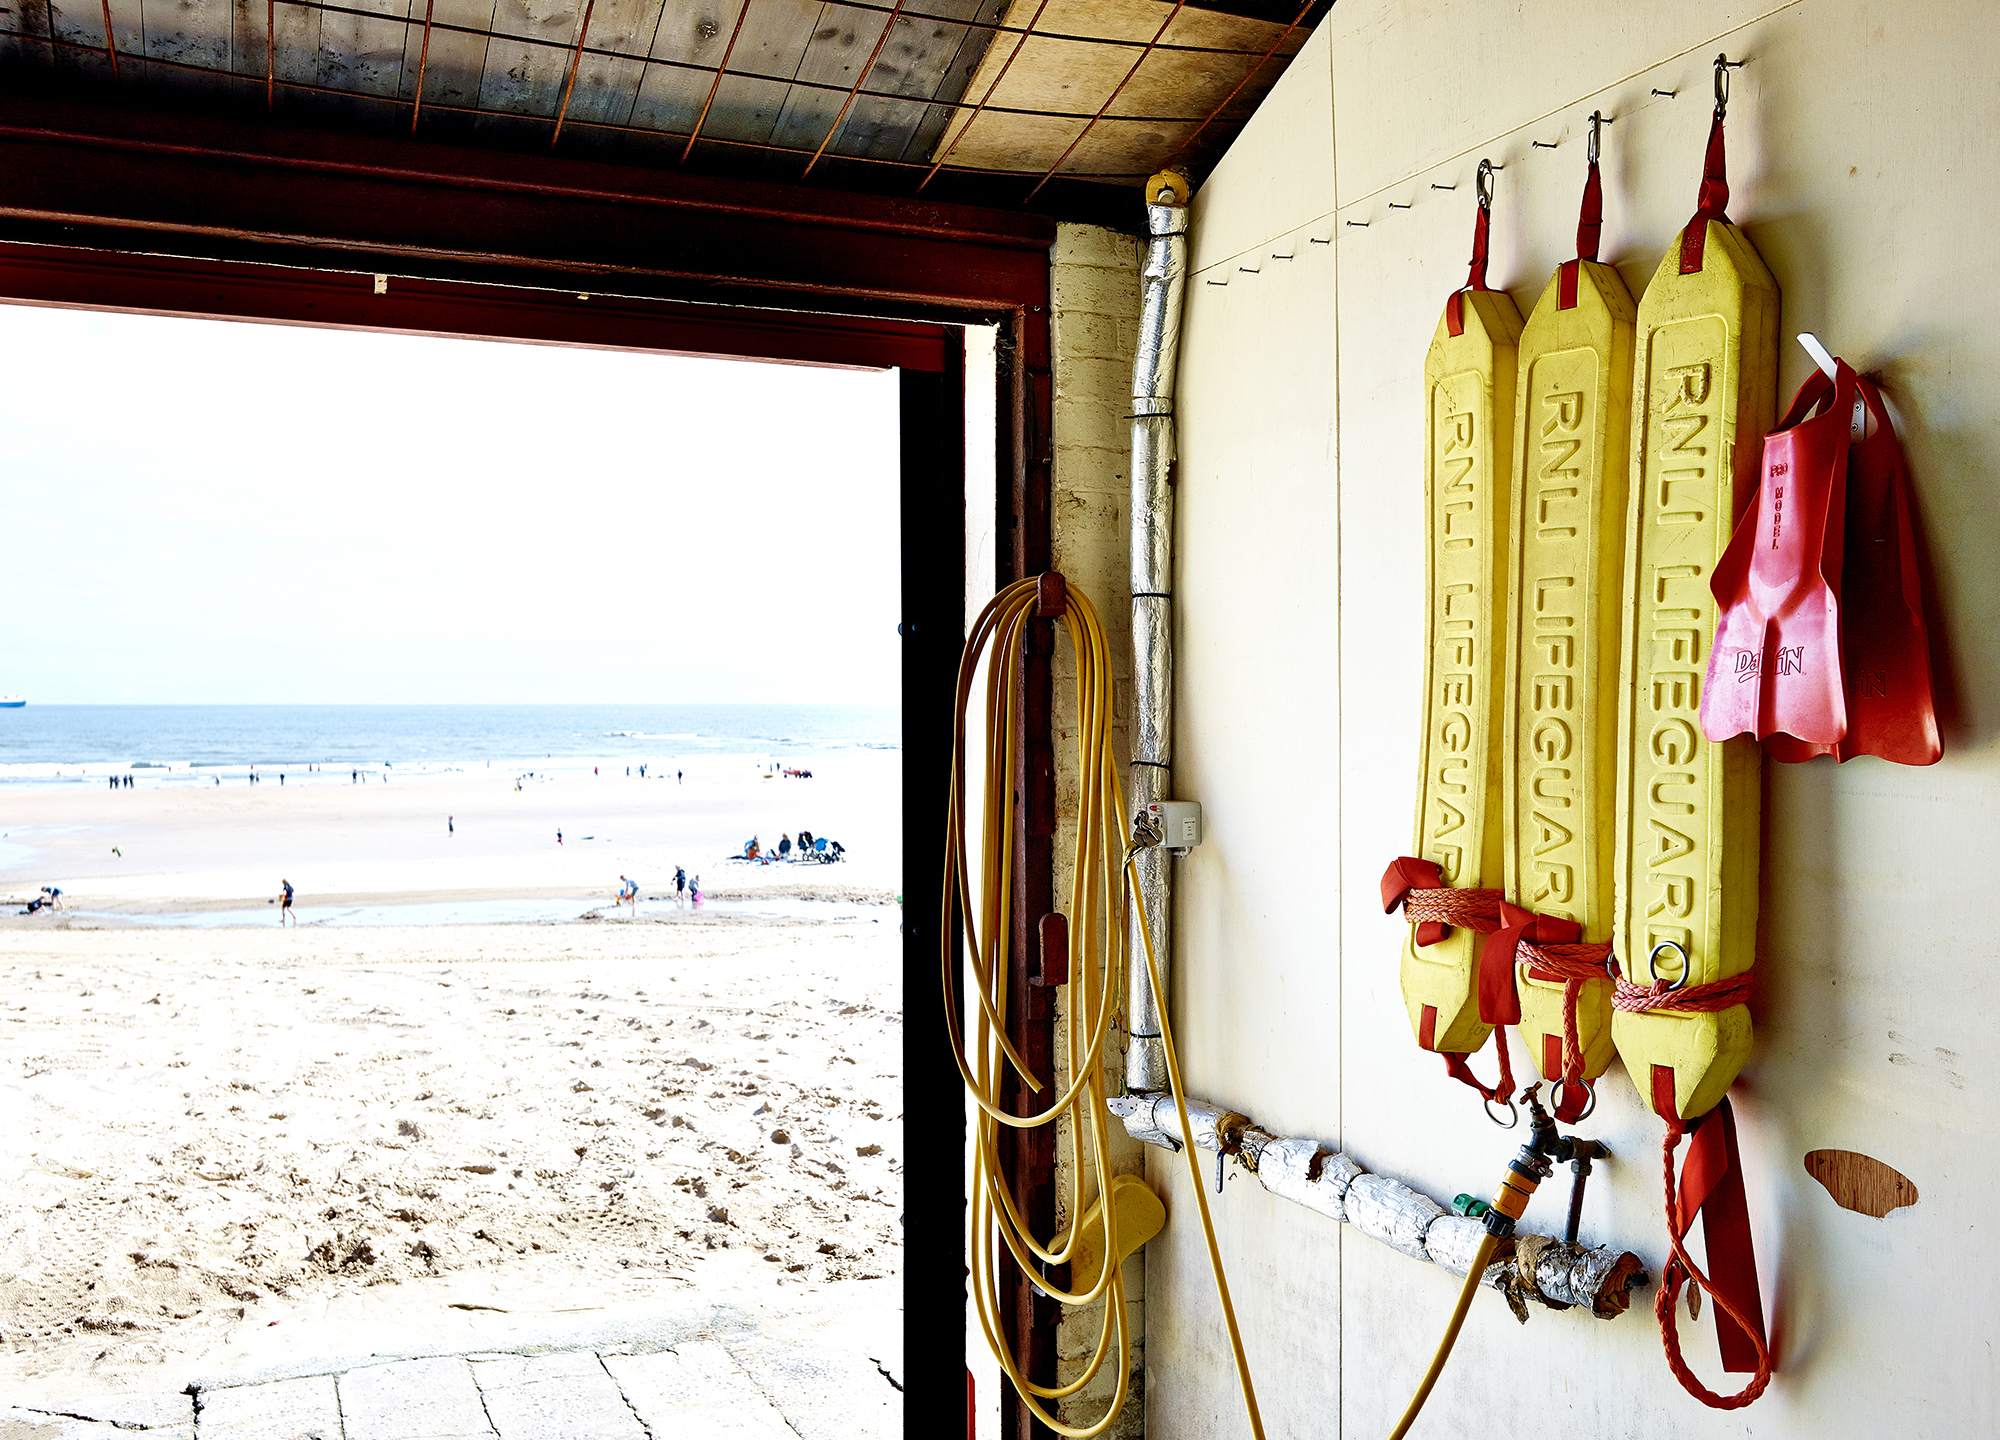 John Donoghue - lifeguard shed